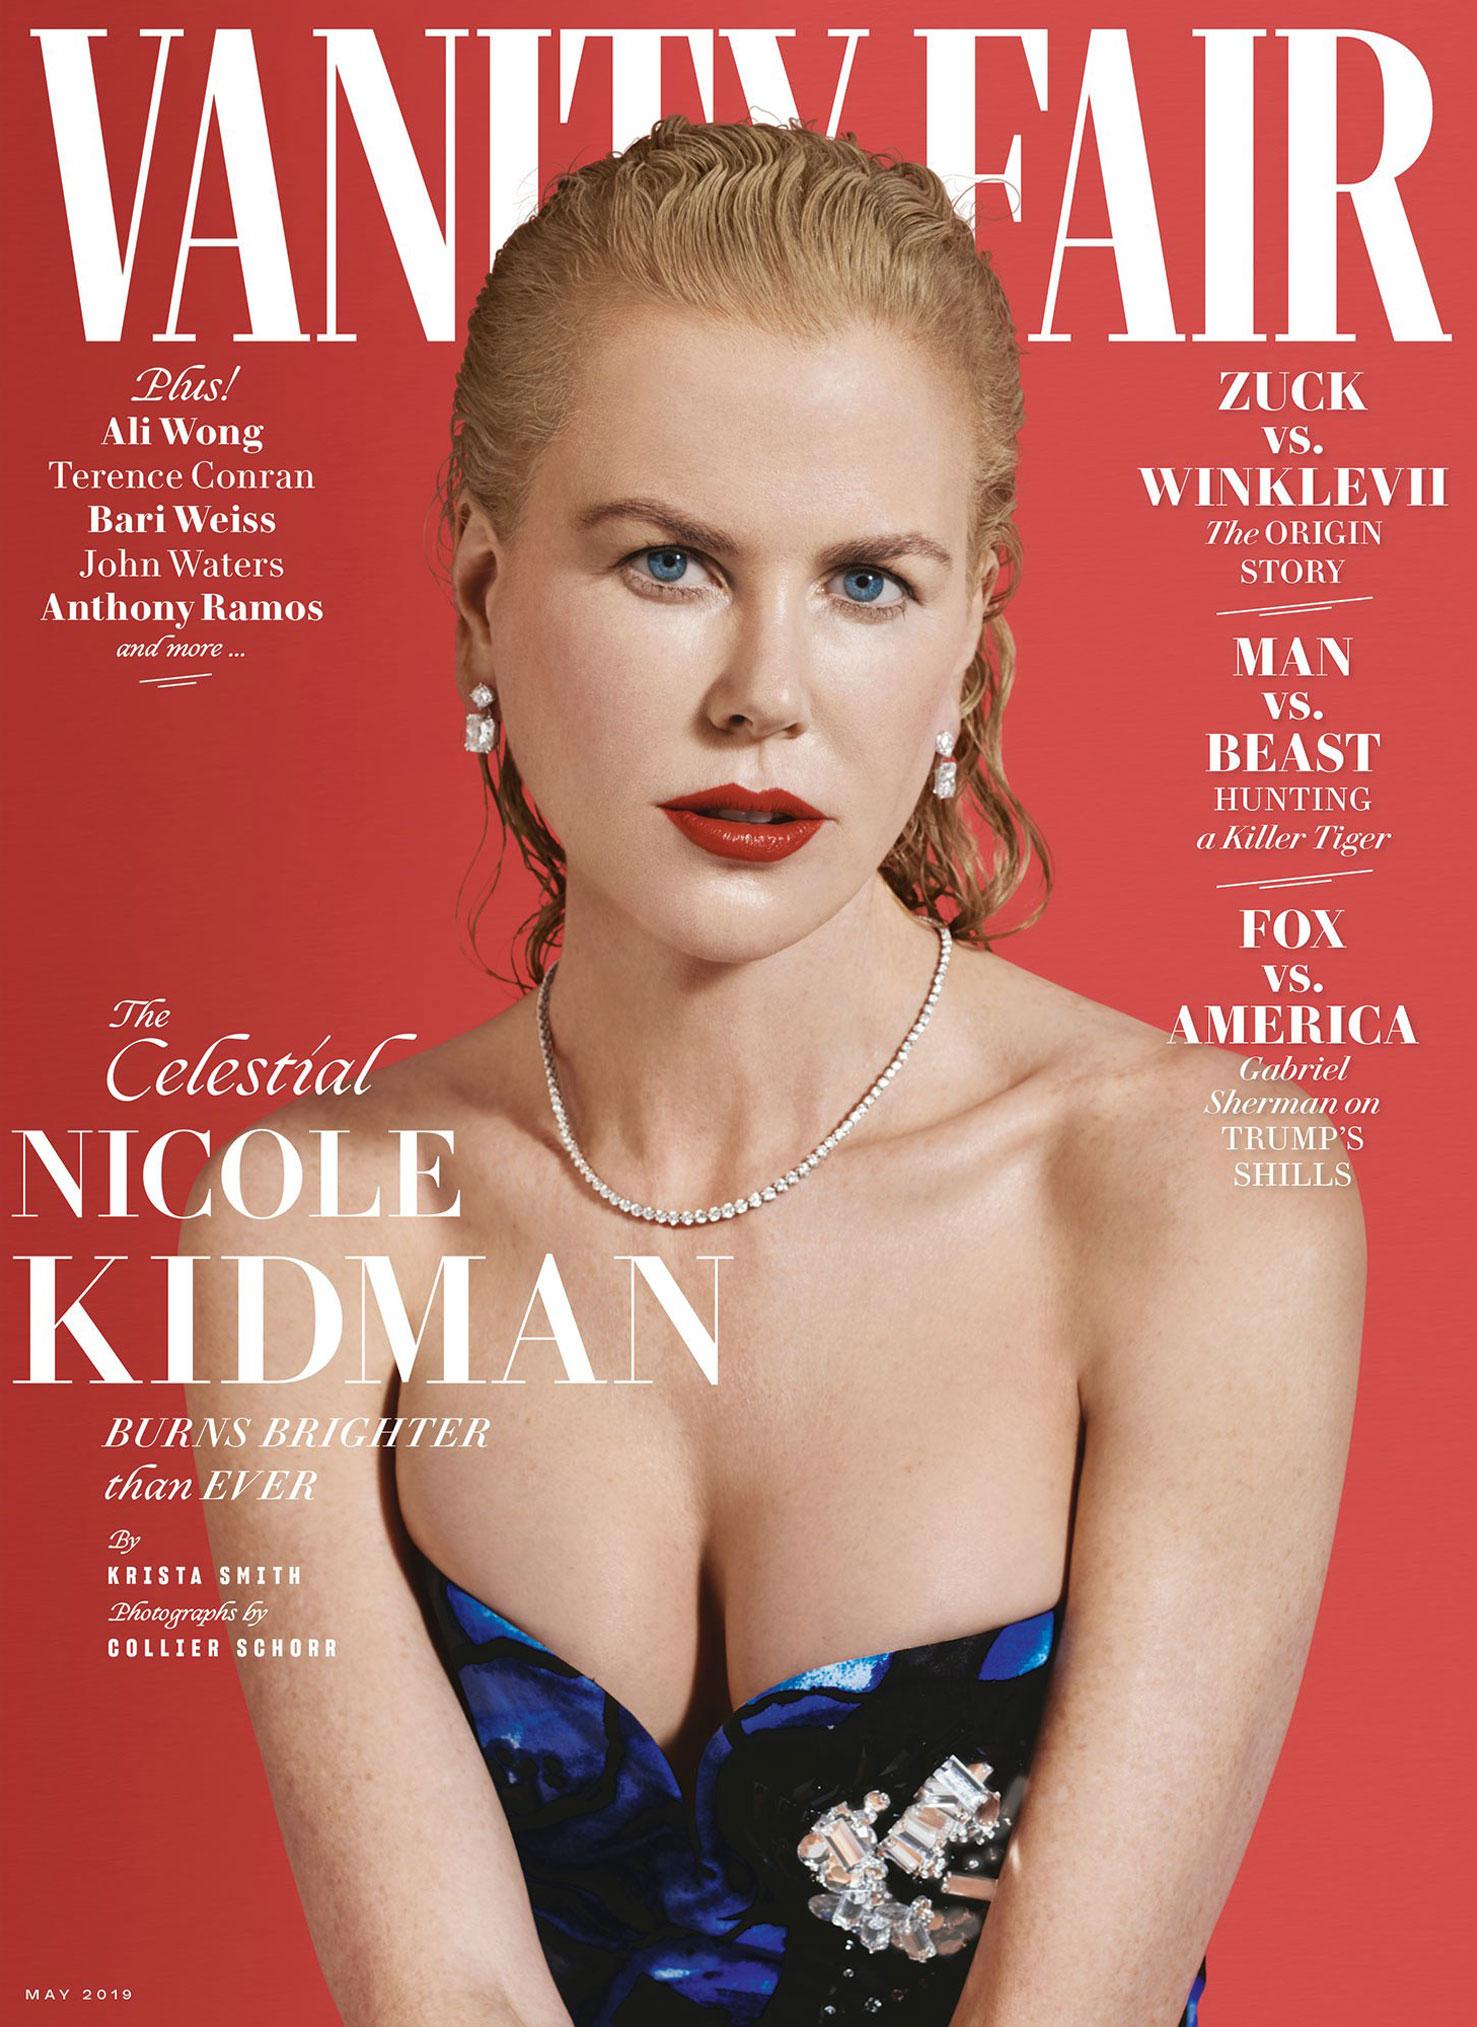 Николь Кидман в журнале Vanity Fair, май 2019 / фото 11